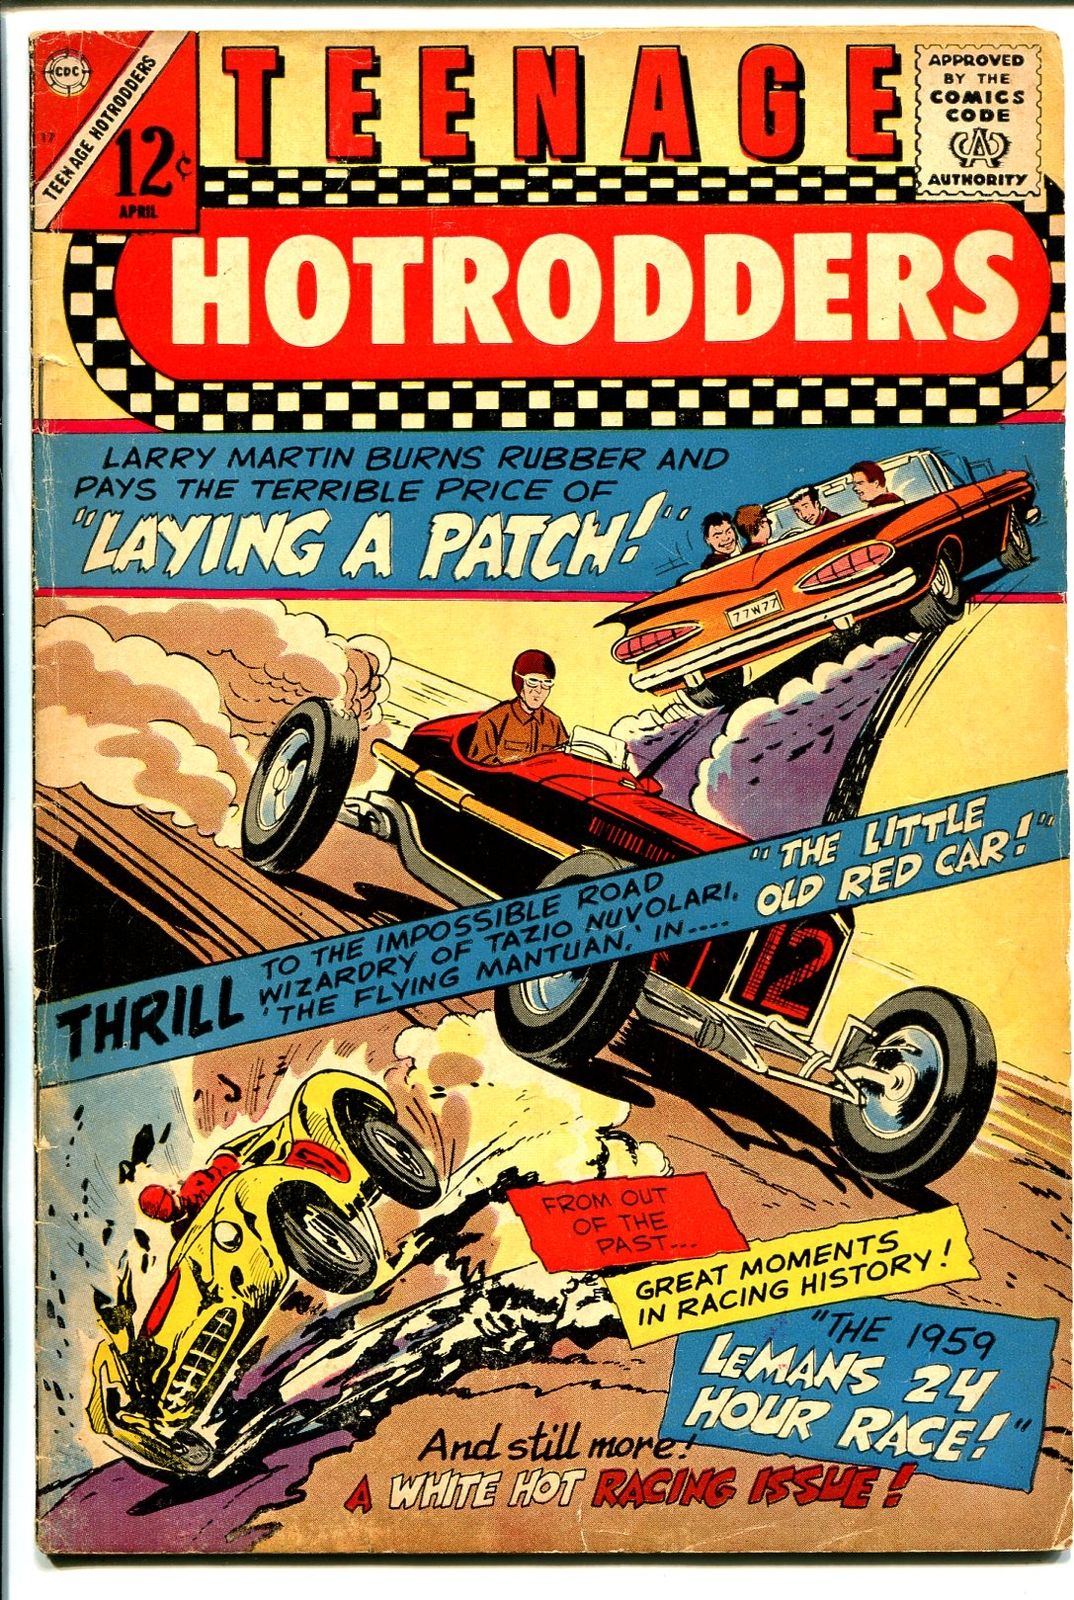 Teenage Hotrodders #17 1966-Charlton-1959 Chevy Impala convertible ...